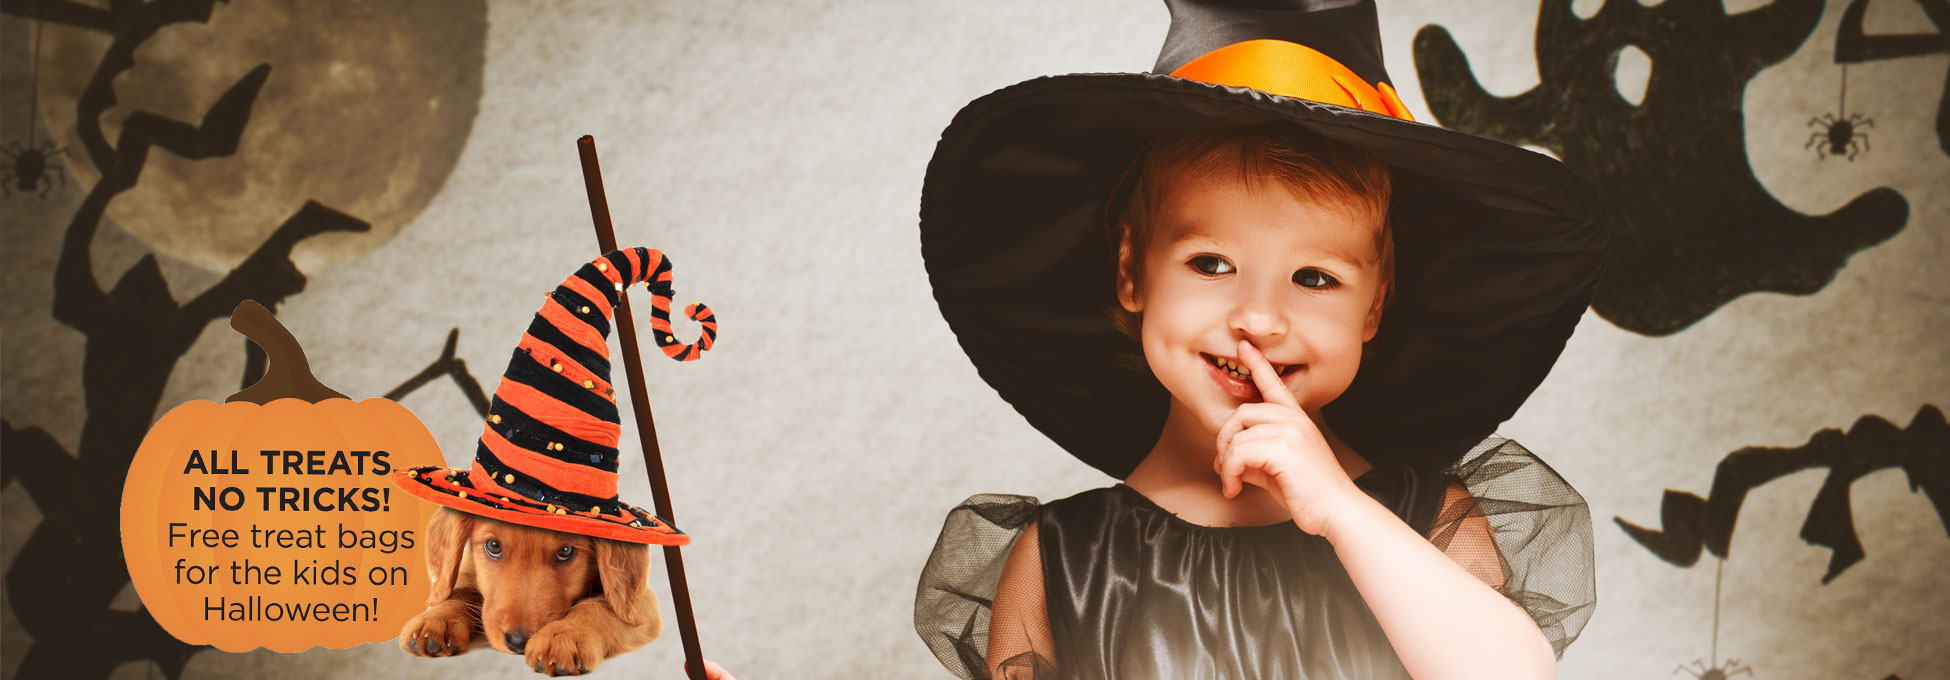 trigs-homepg-halloween-costume-contests.jpg